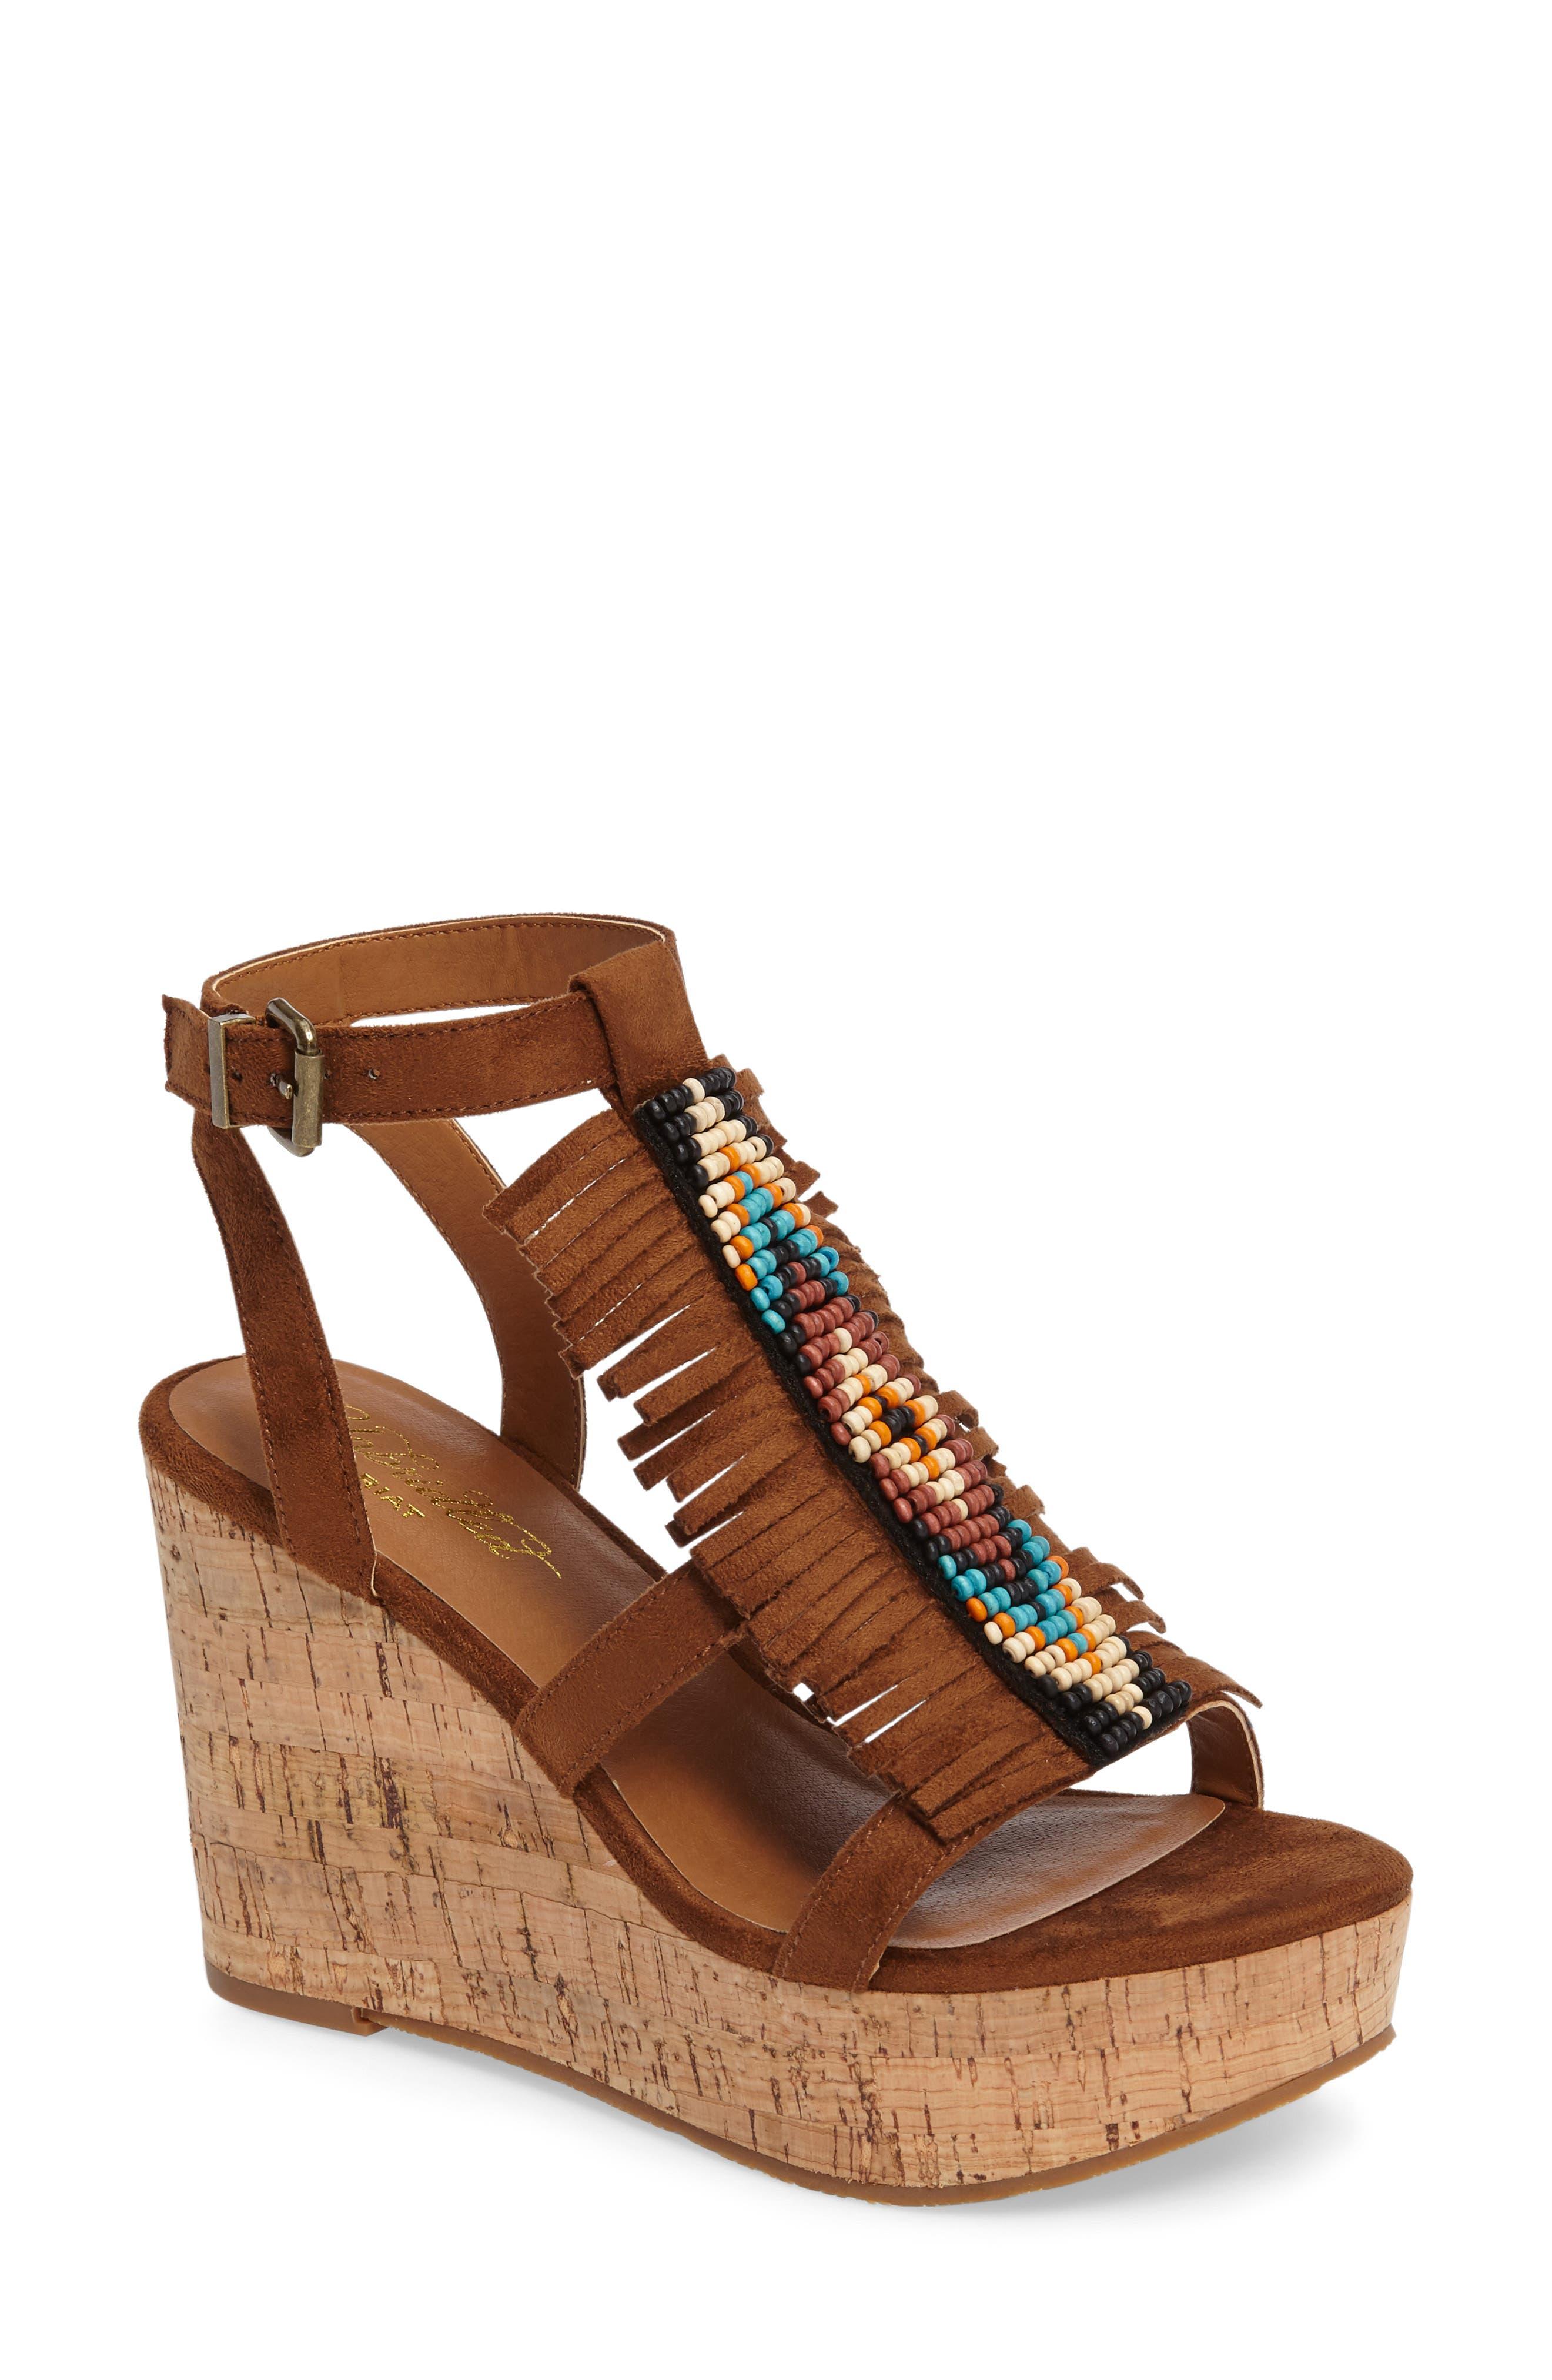 Ariat Unbridled Lolita Wedge Sandal (Women)